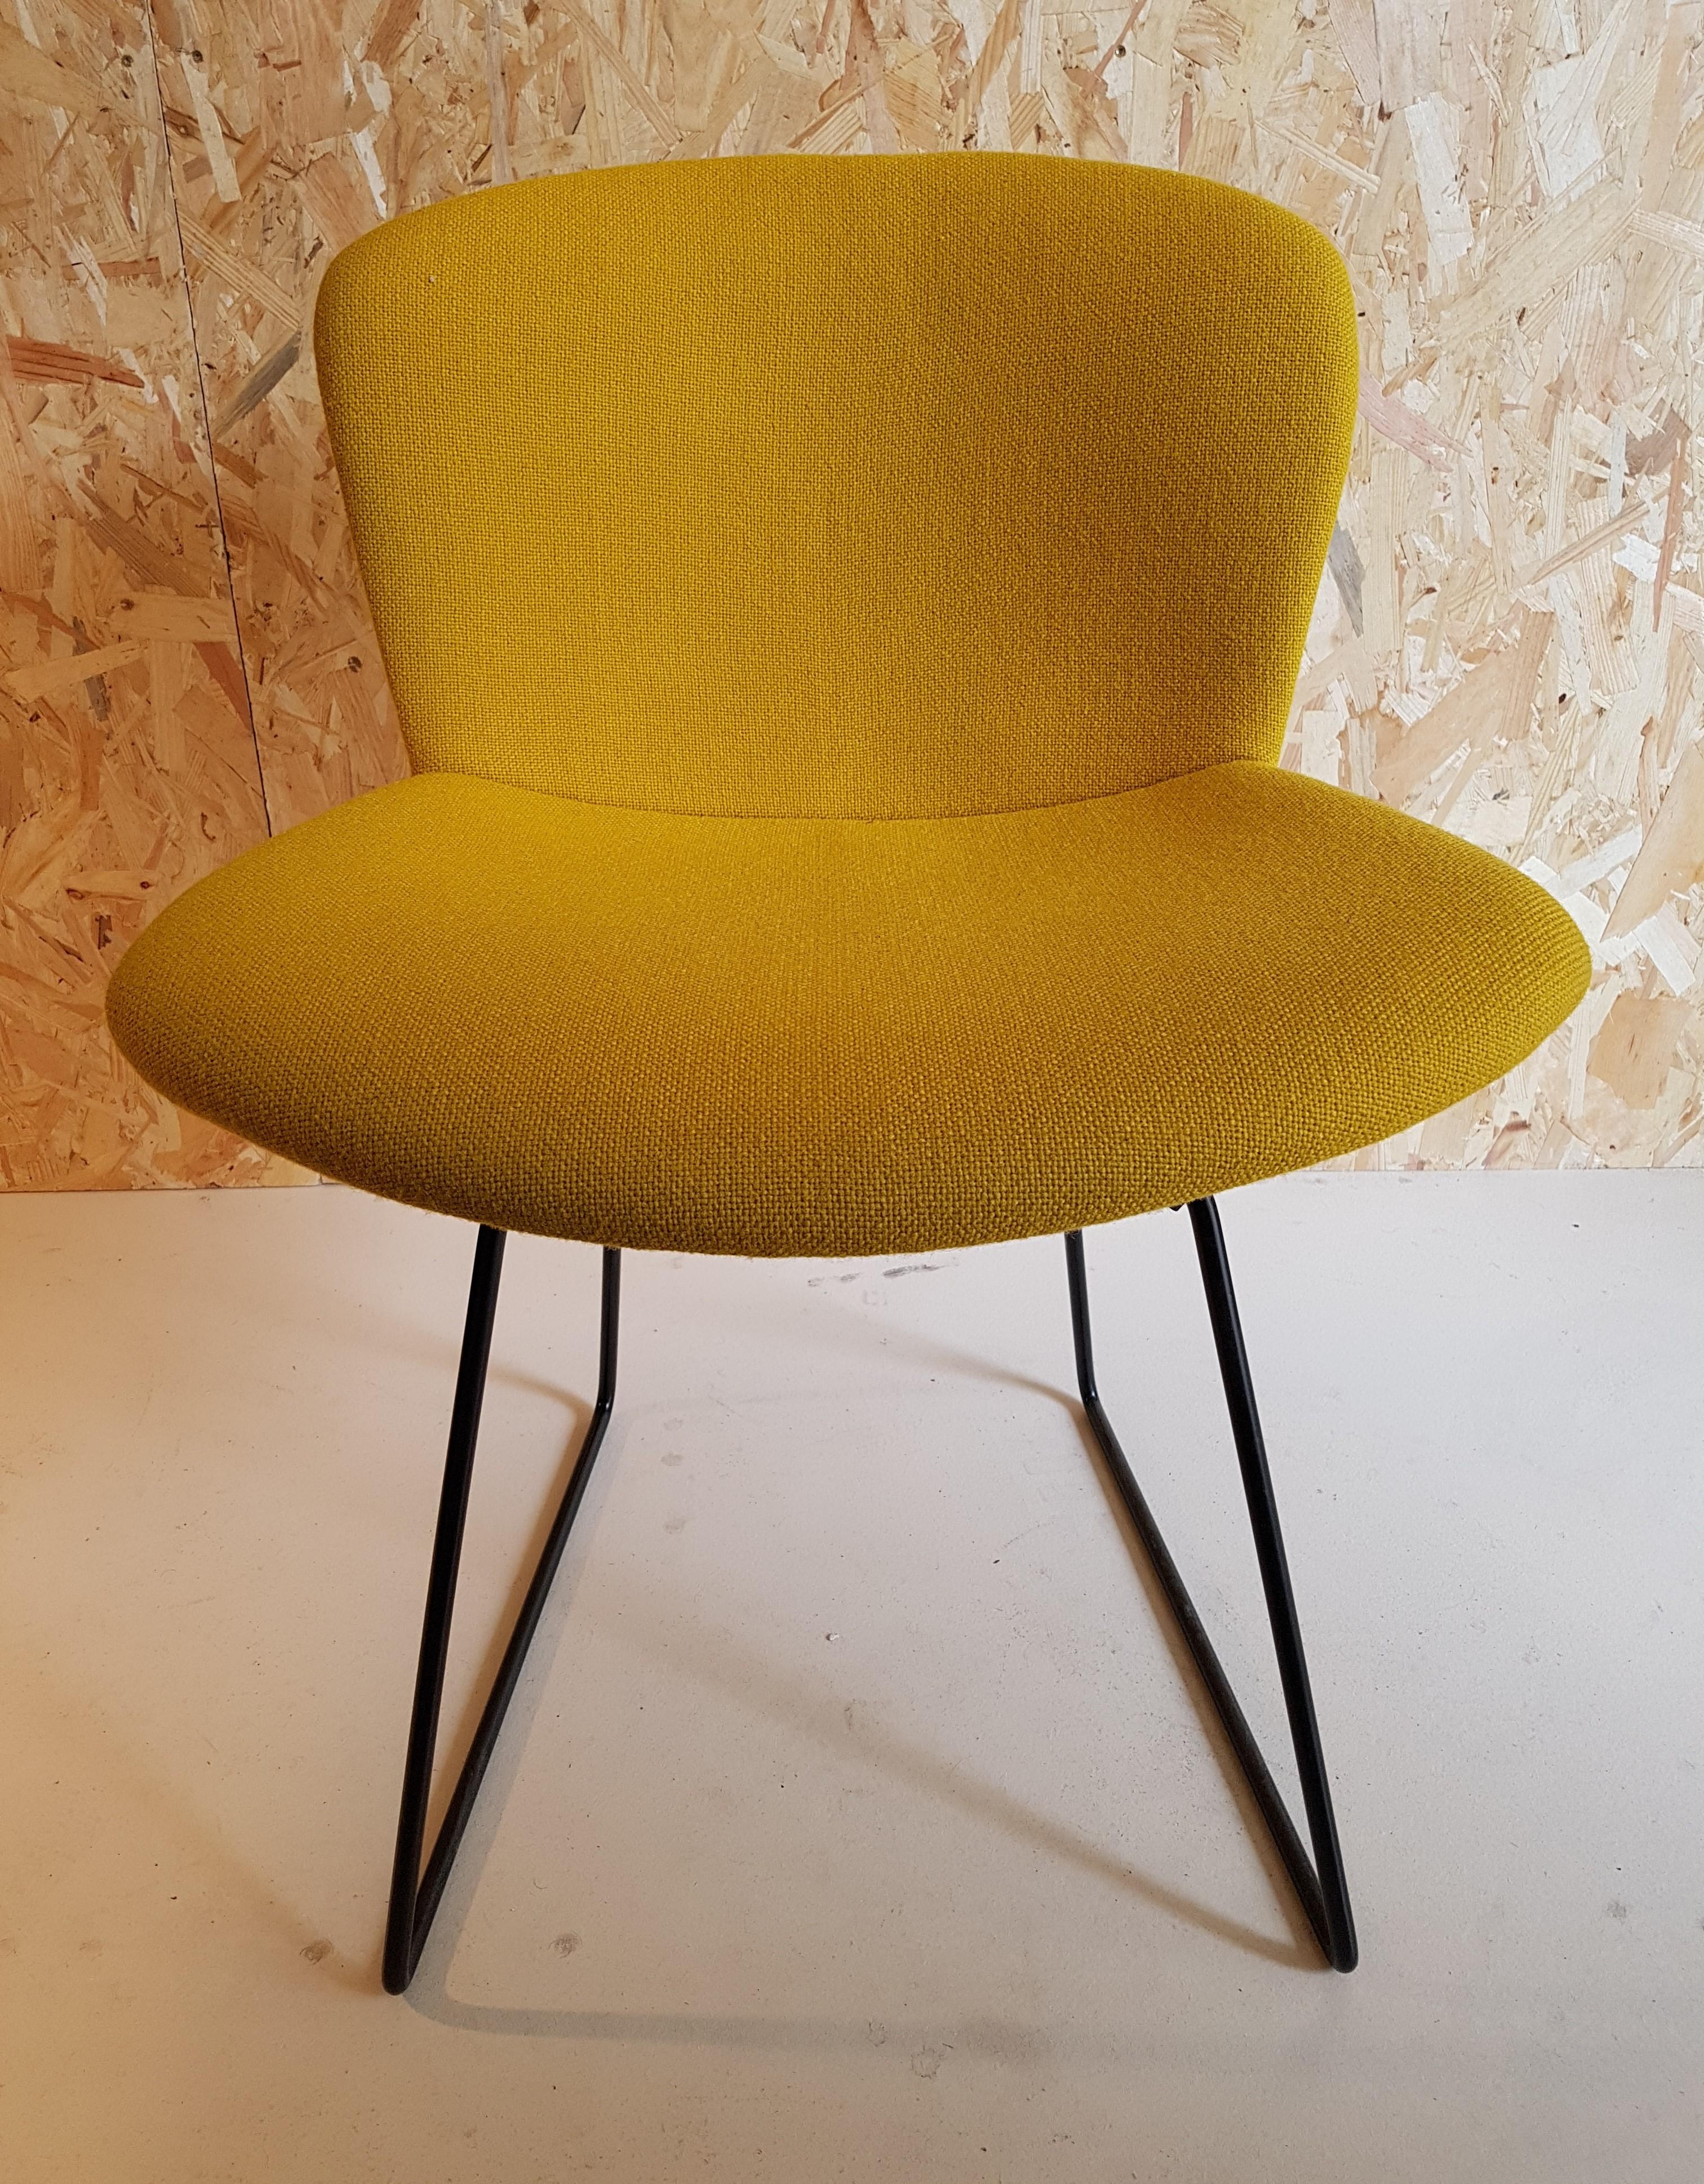 Black metal chair by Harry Bertoia for Knoll International 1960s